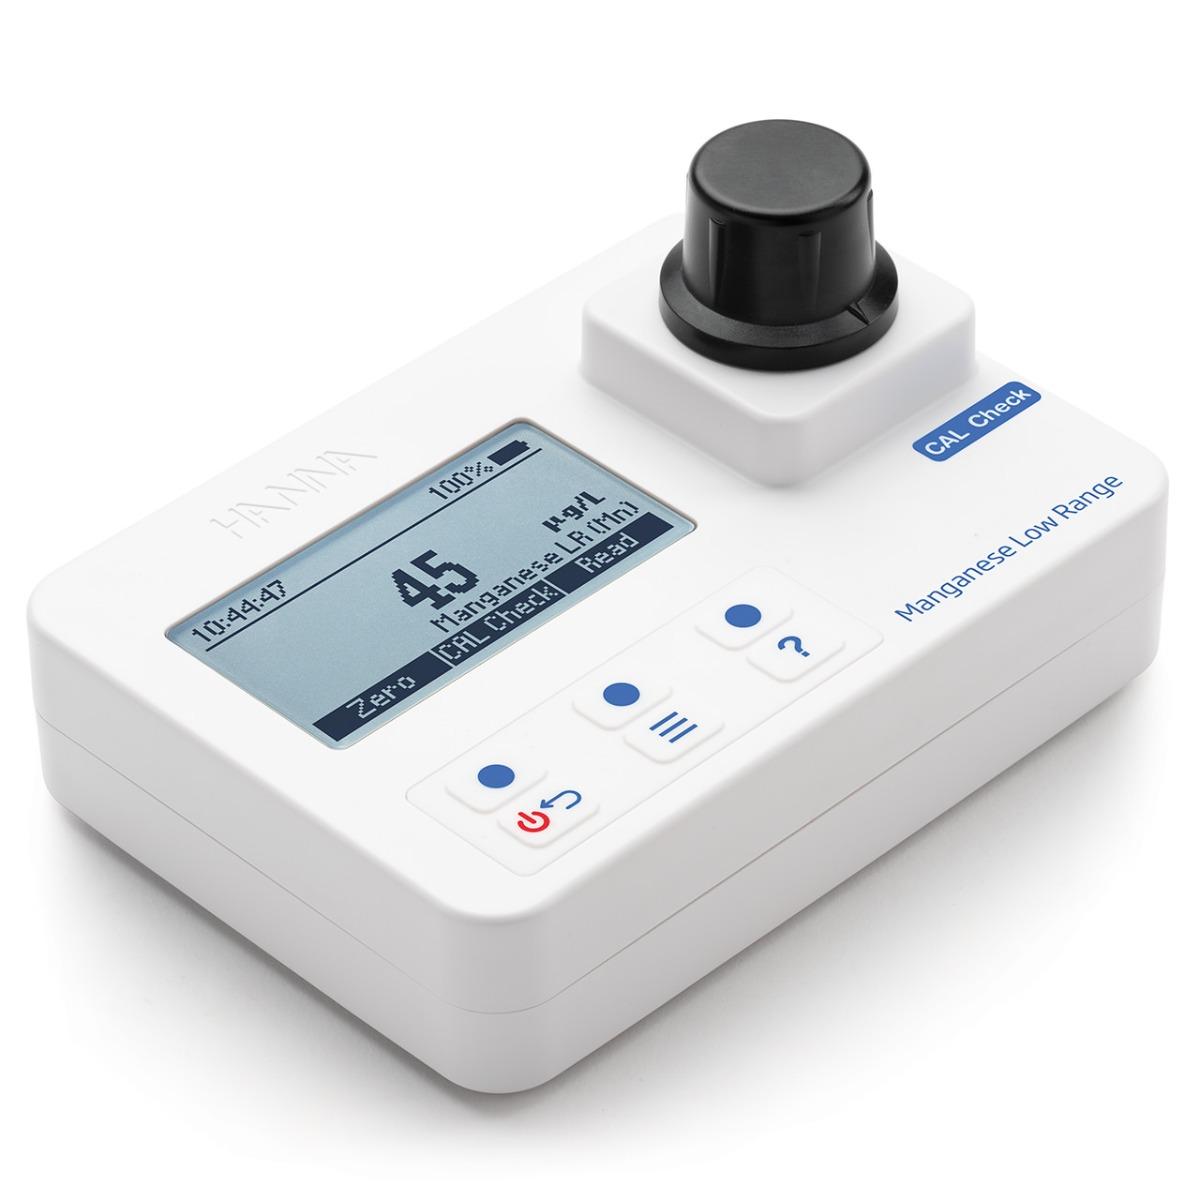 Manganese Low-Range Portable Photometer with CAL Check – HI97748